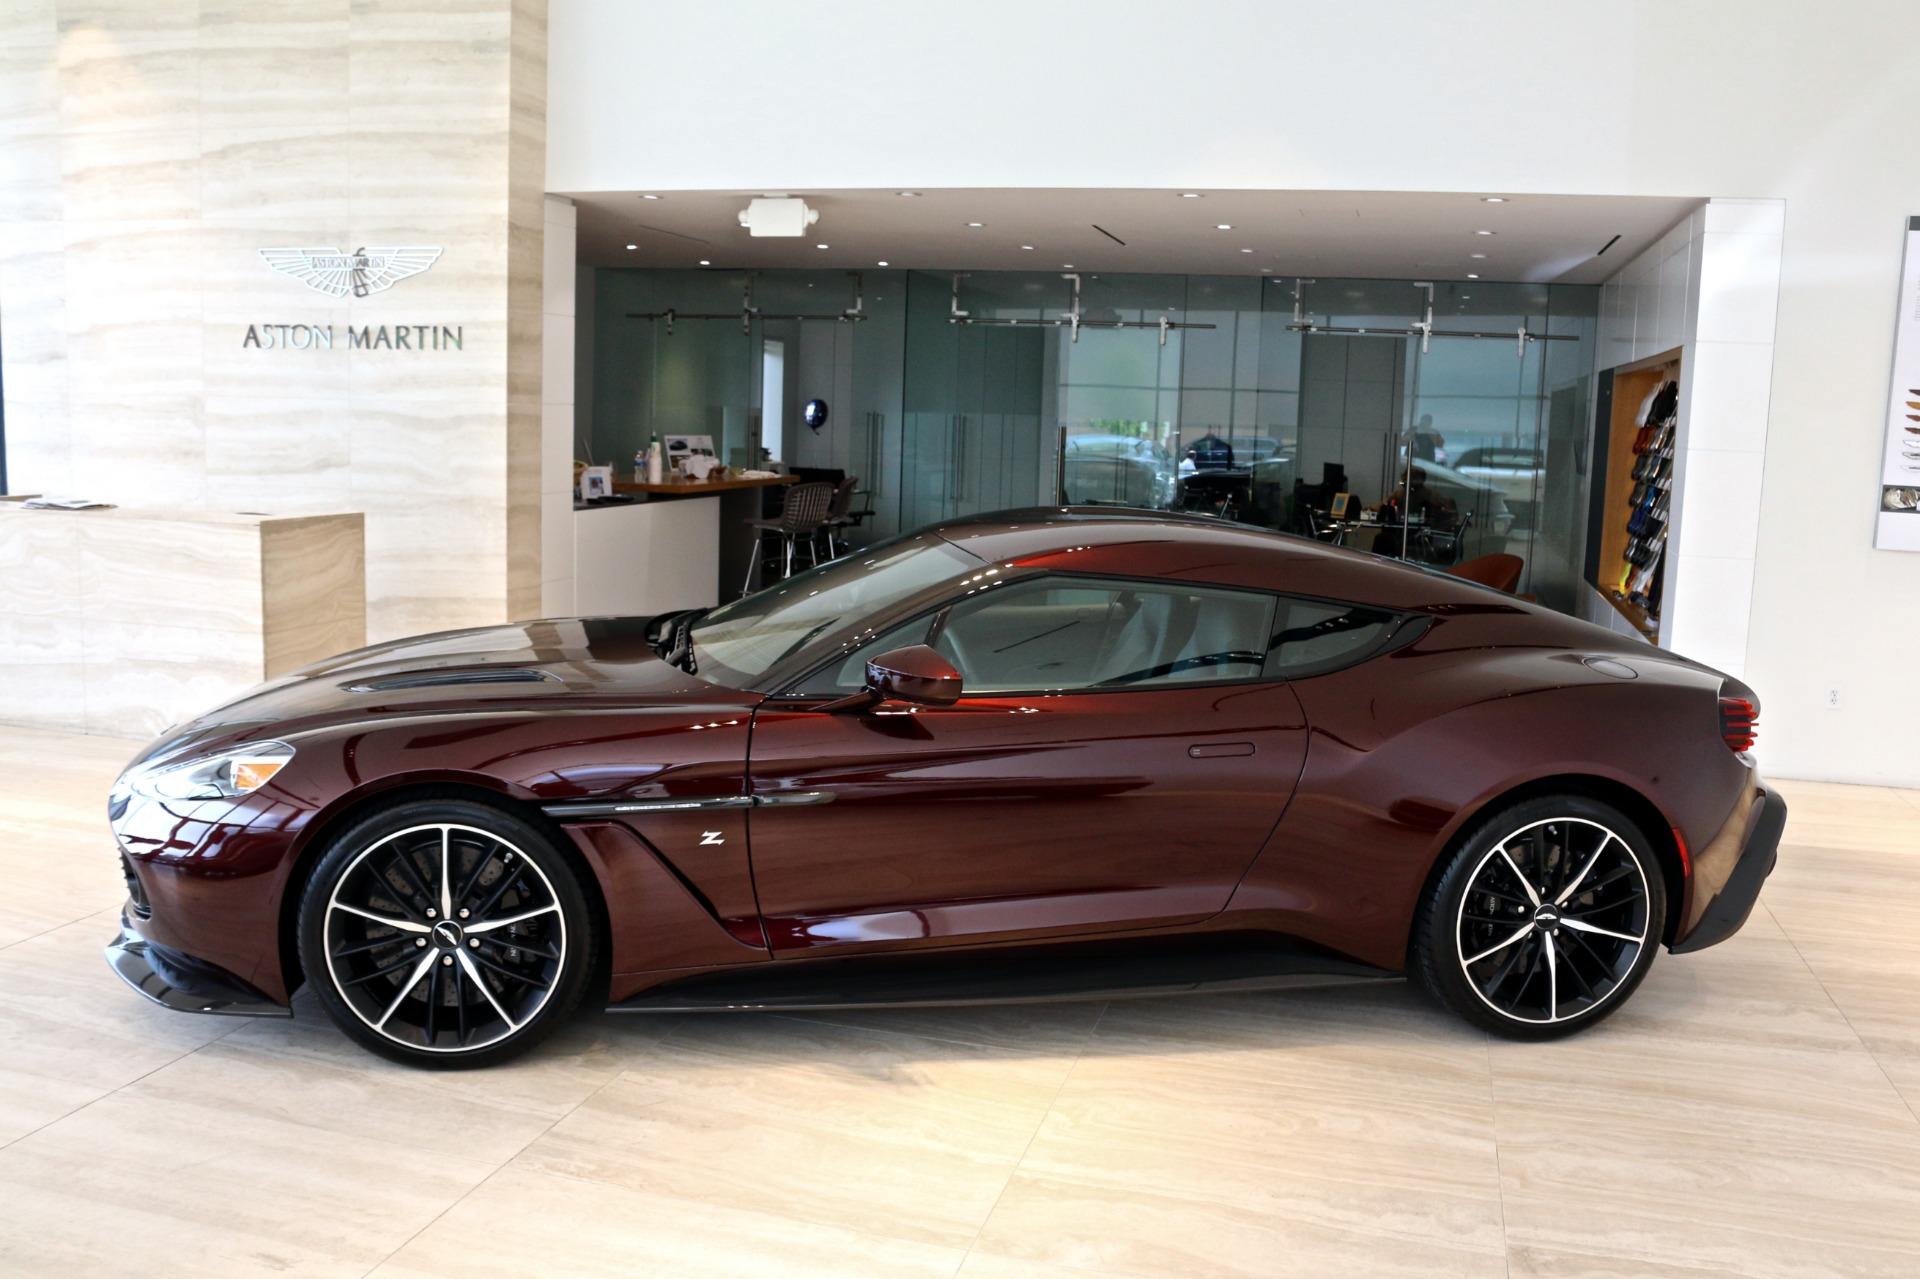 2018 Aston Martin Vanquish Zagato Coupe 78 99 Stock Pj33902 For Sale Near Vienna Va Va Aston Martin Dealer